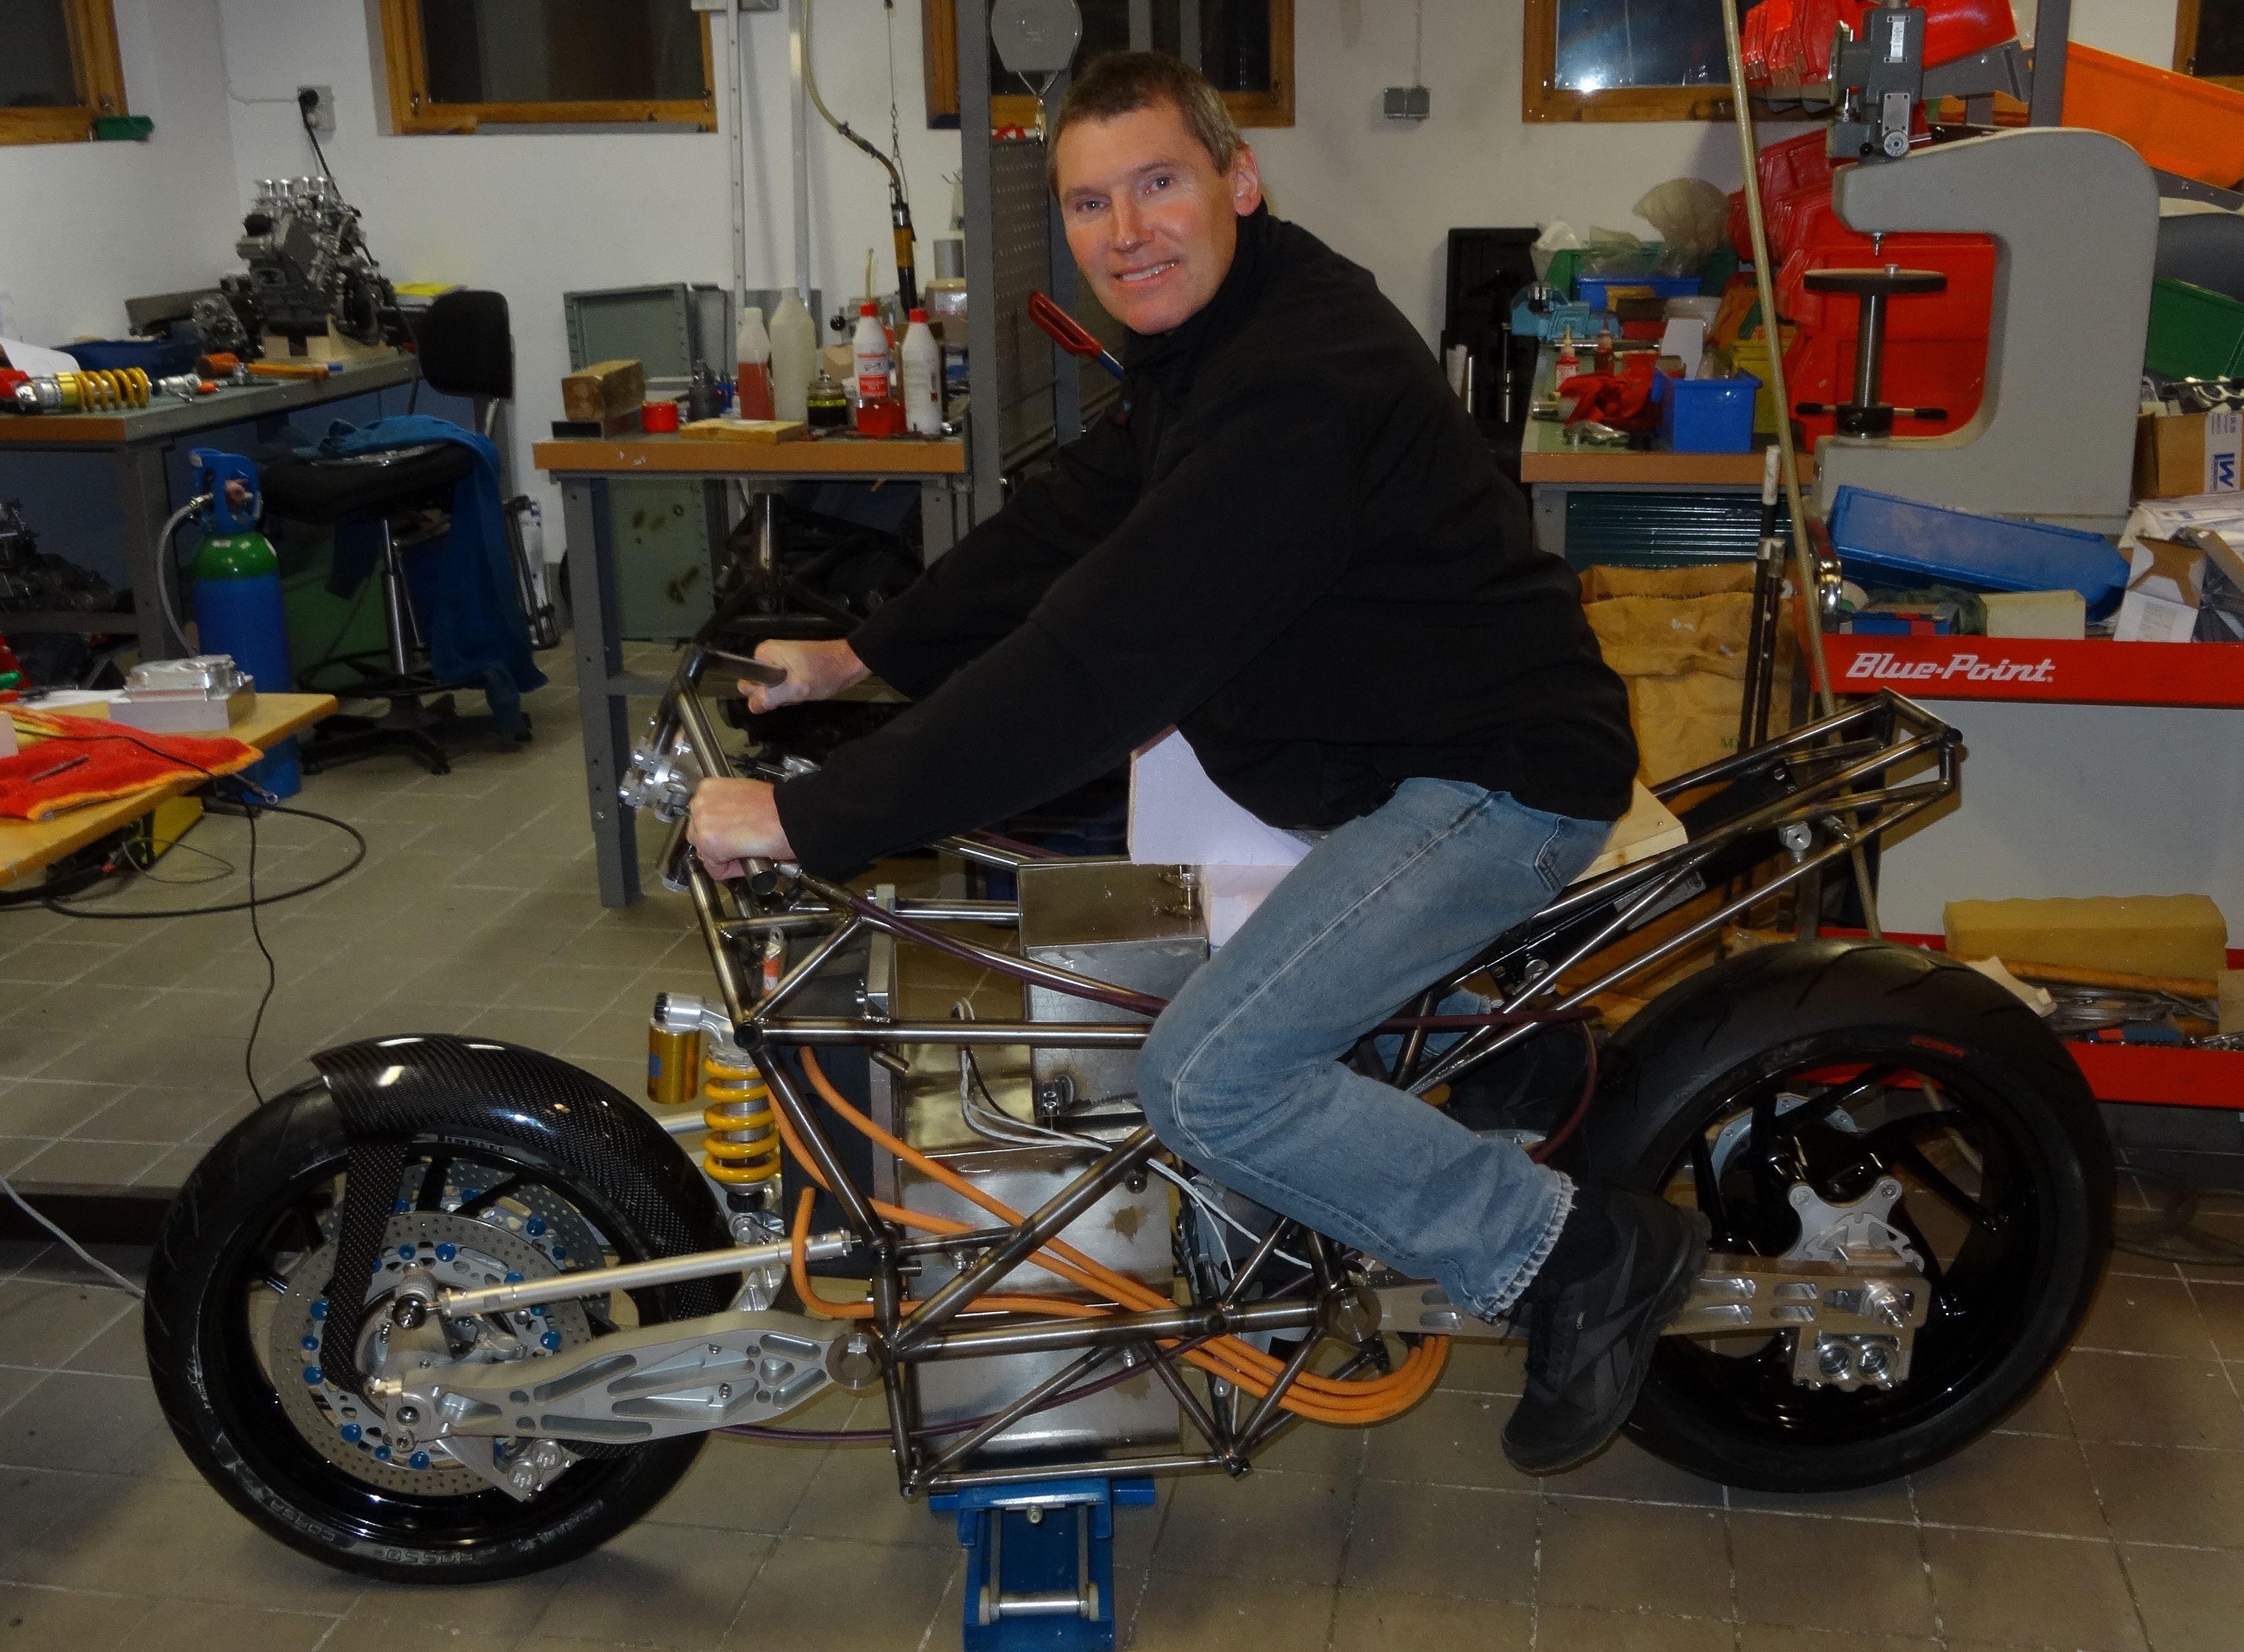 Gallery - Aliquis AB, Electric Superbike, EV superbike